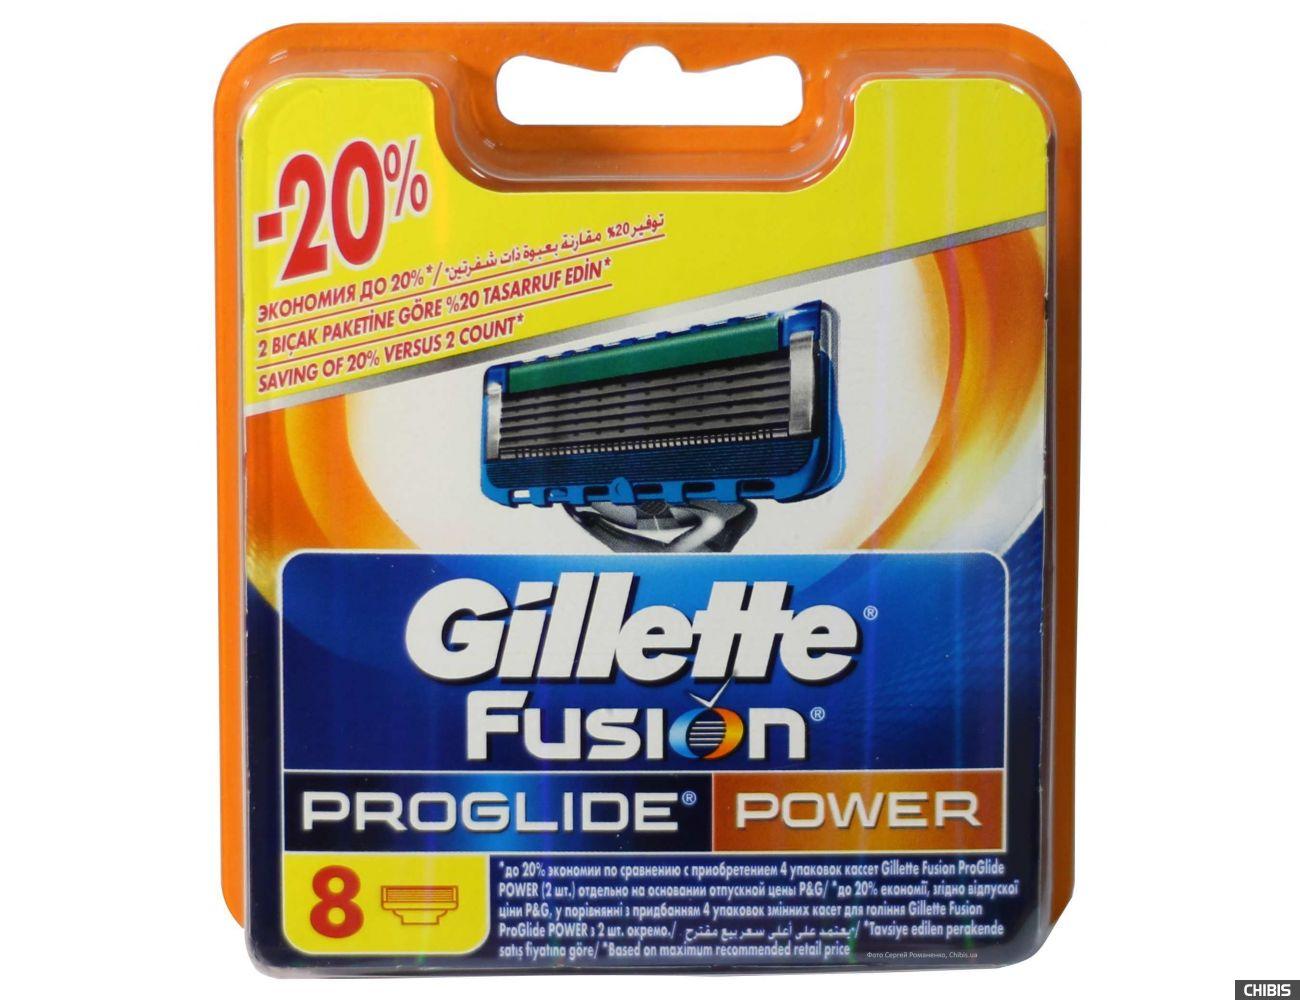 Gillette Fusion ProGlide Power лезвия для станка 8 шт 7702018085606